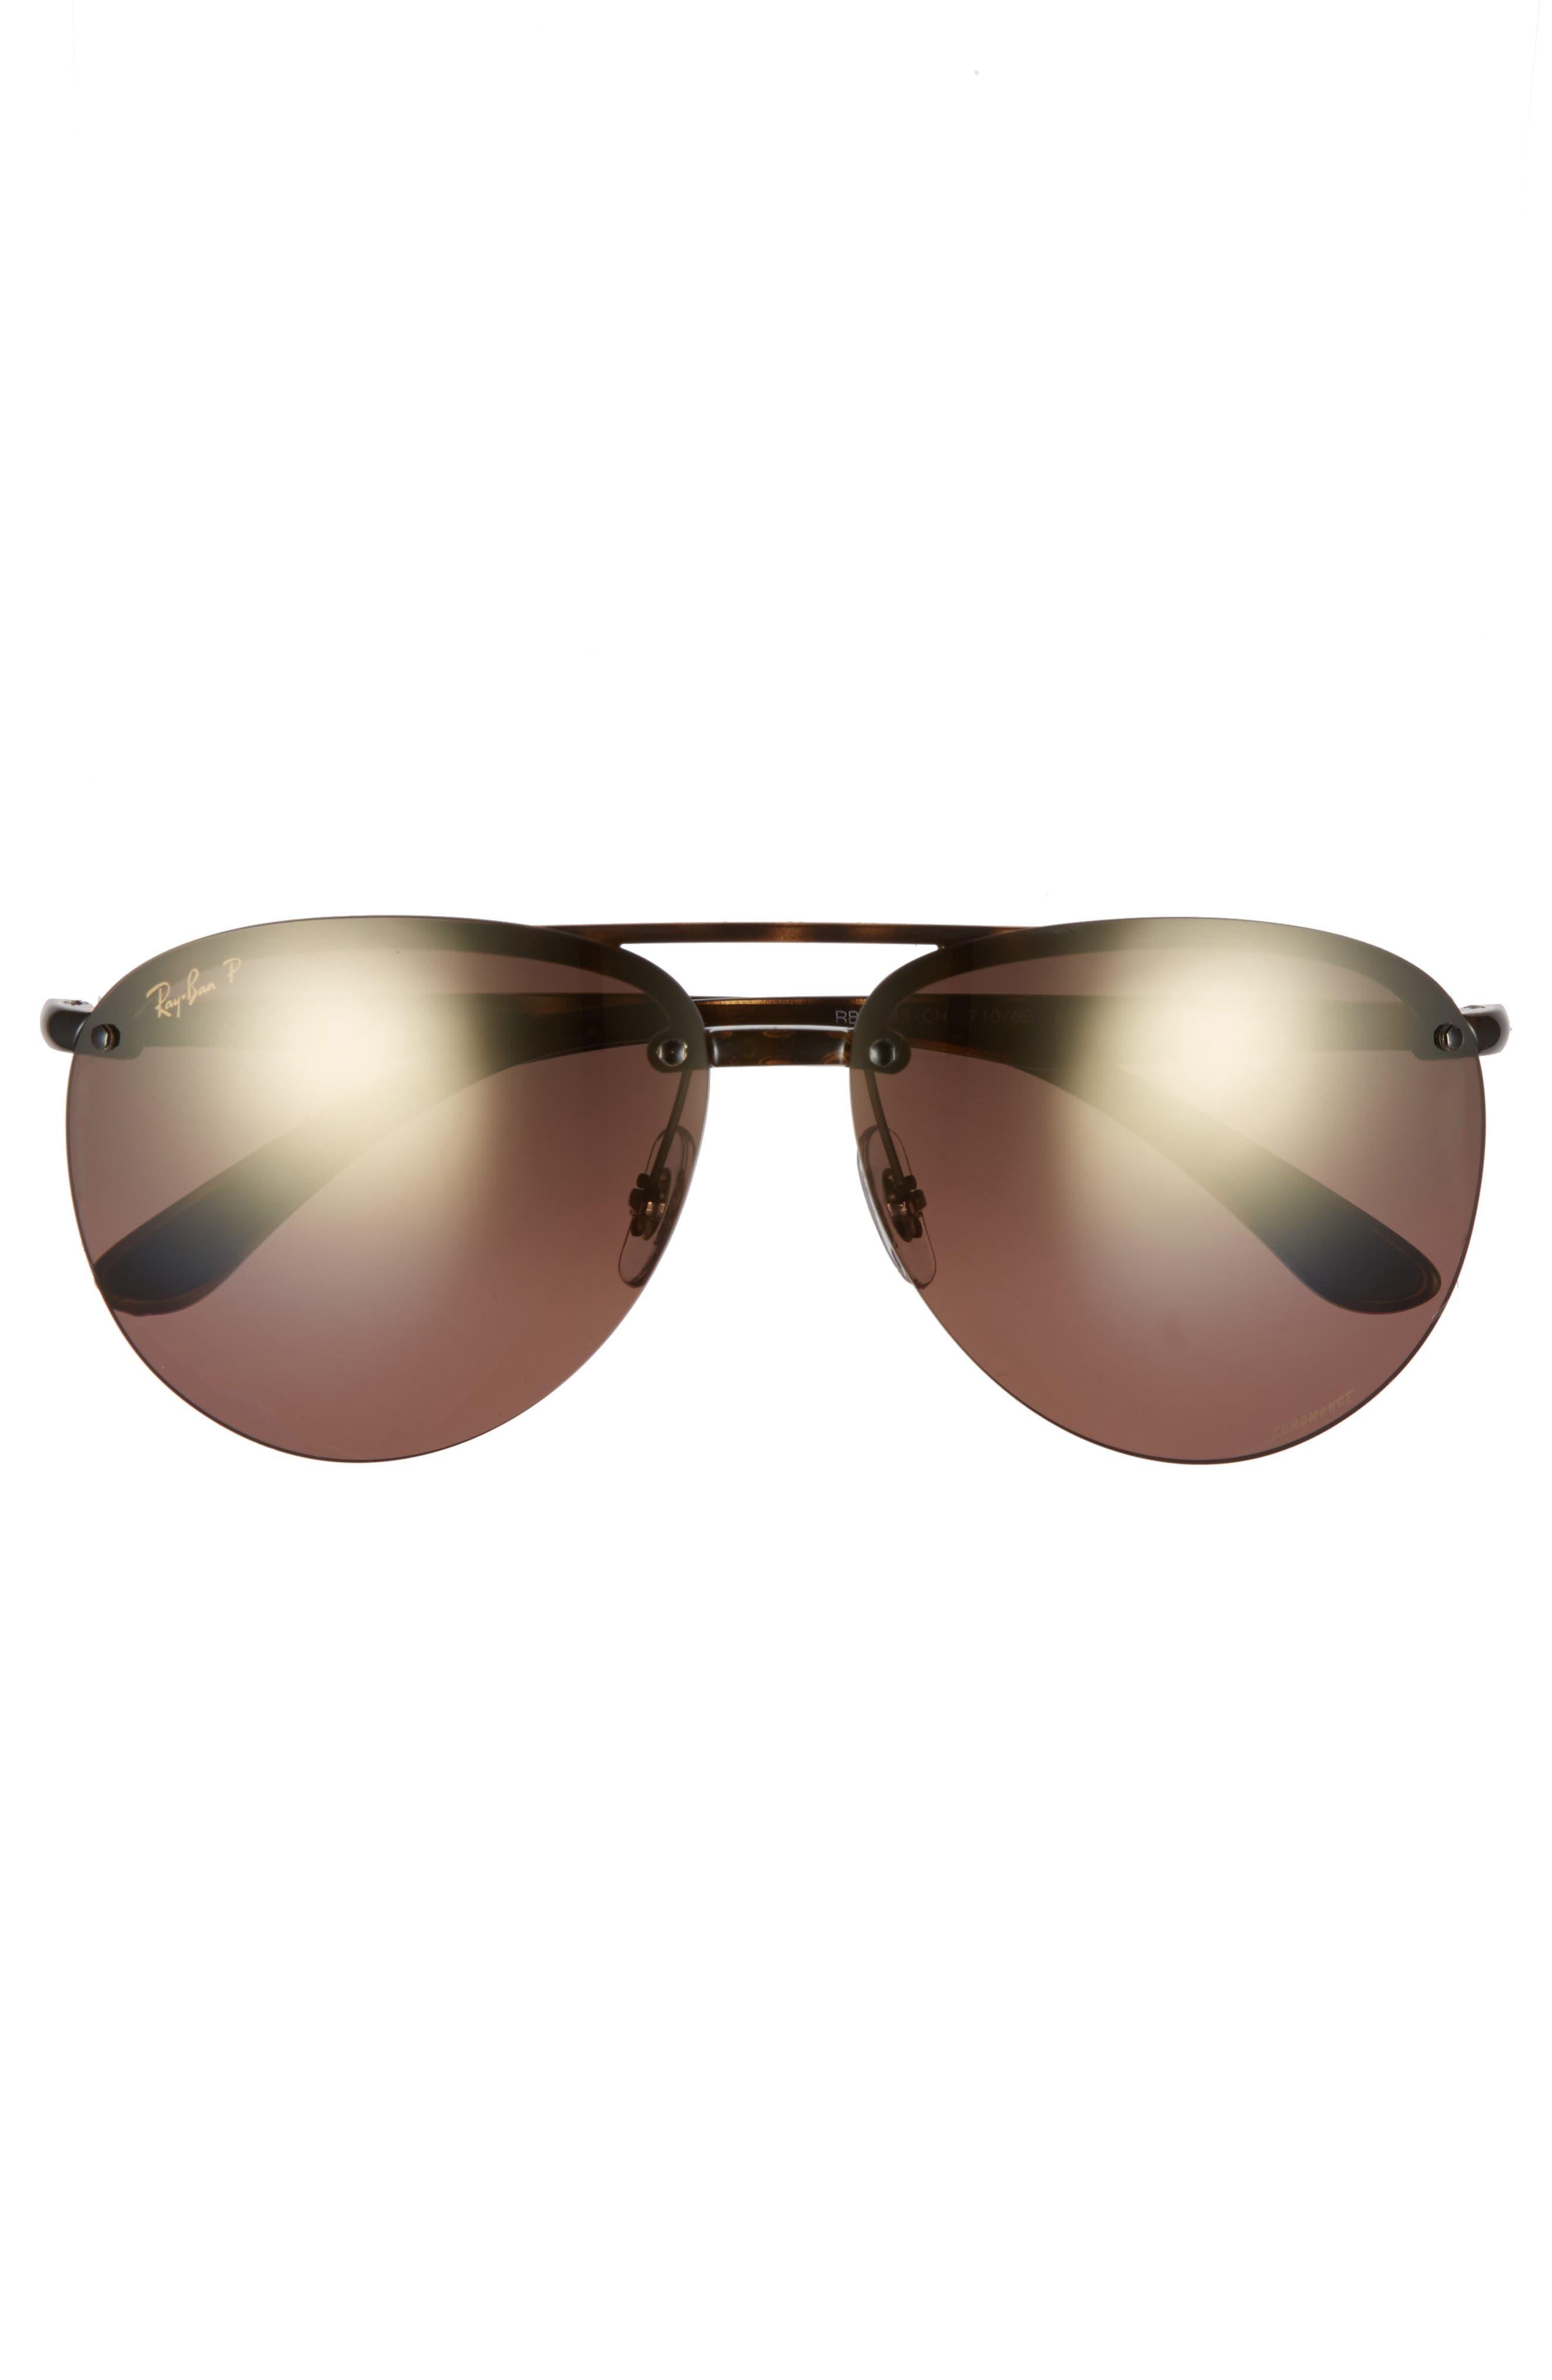 65mm Gradient Aviator Sunglasses,                             Alternate thumbnail 3, color,                             Havana